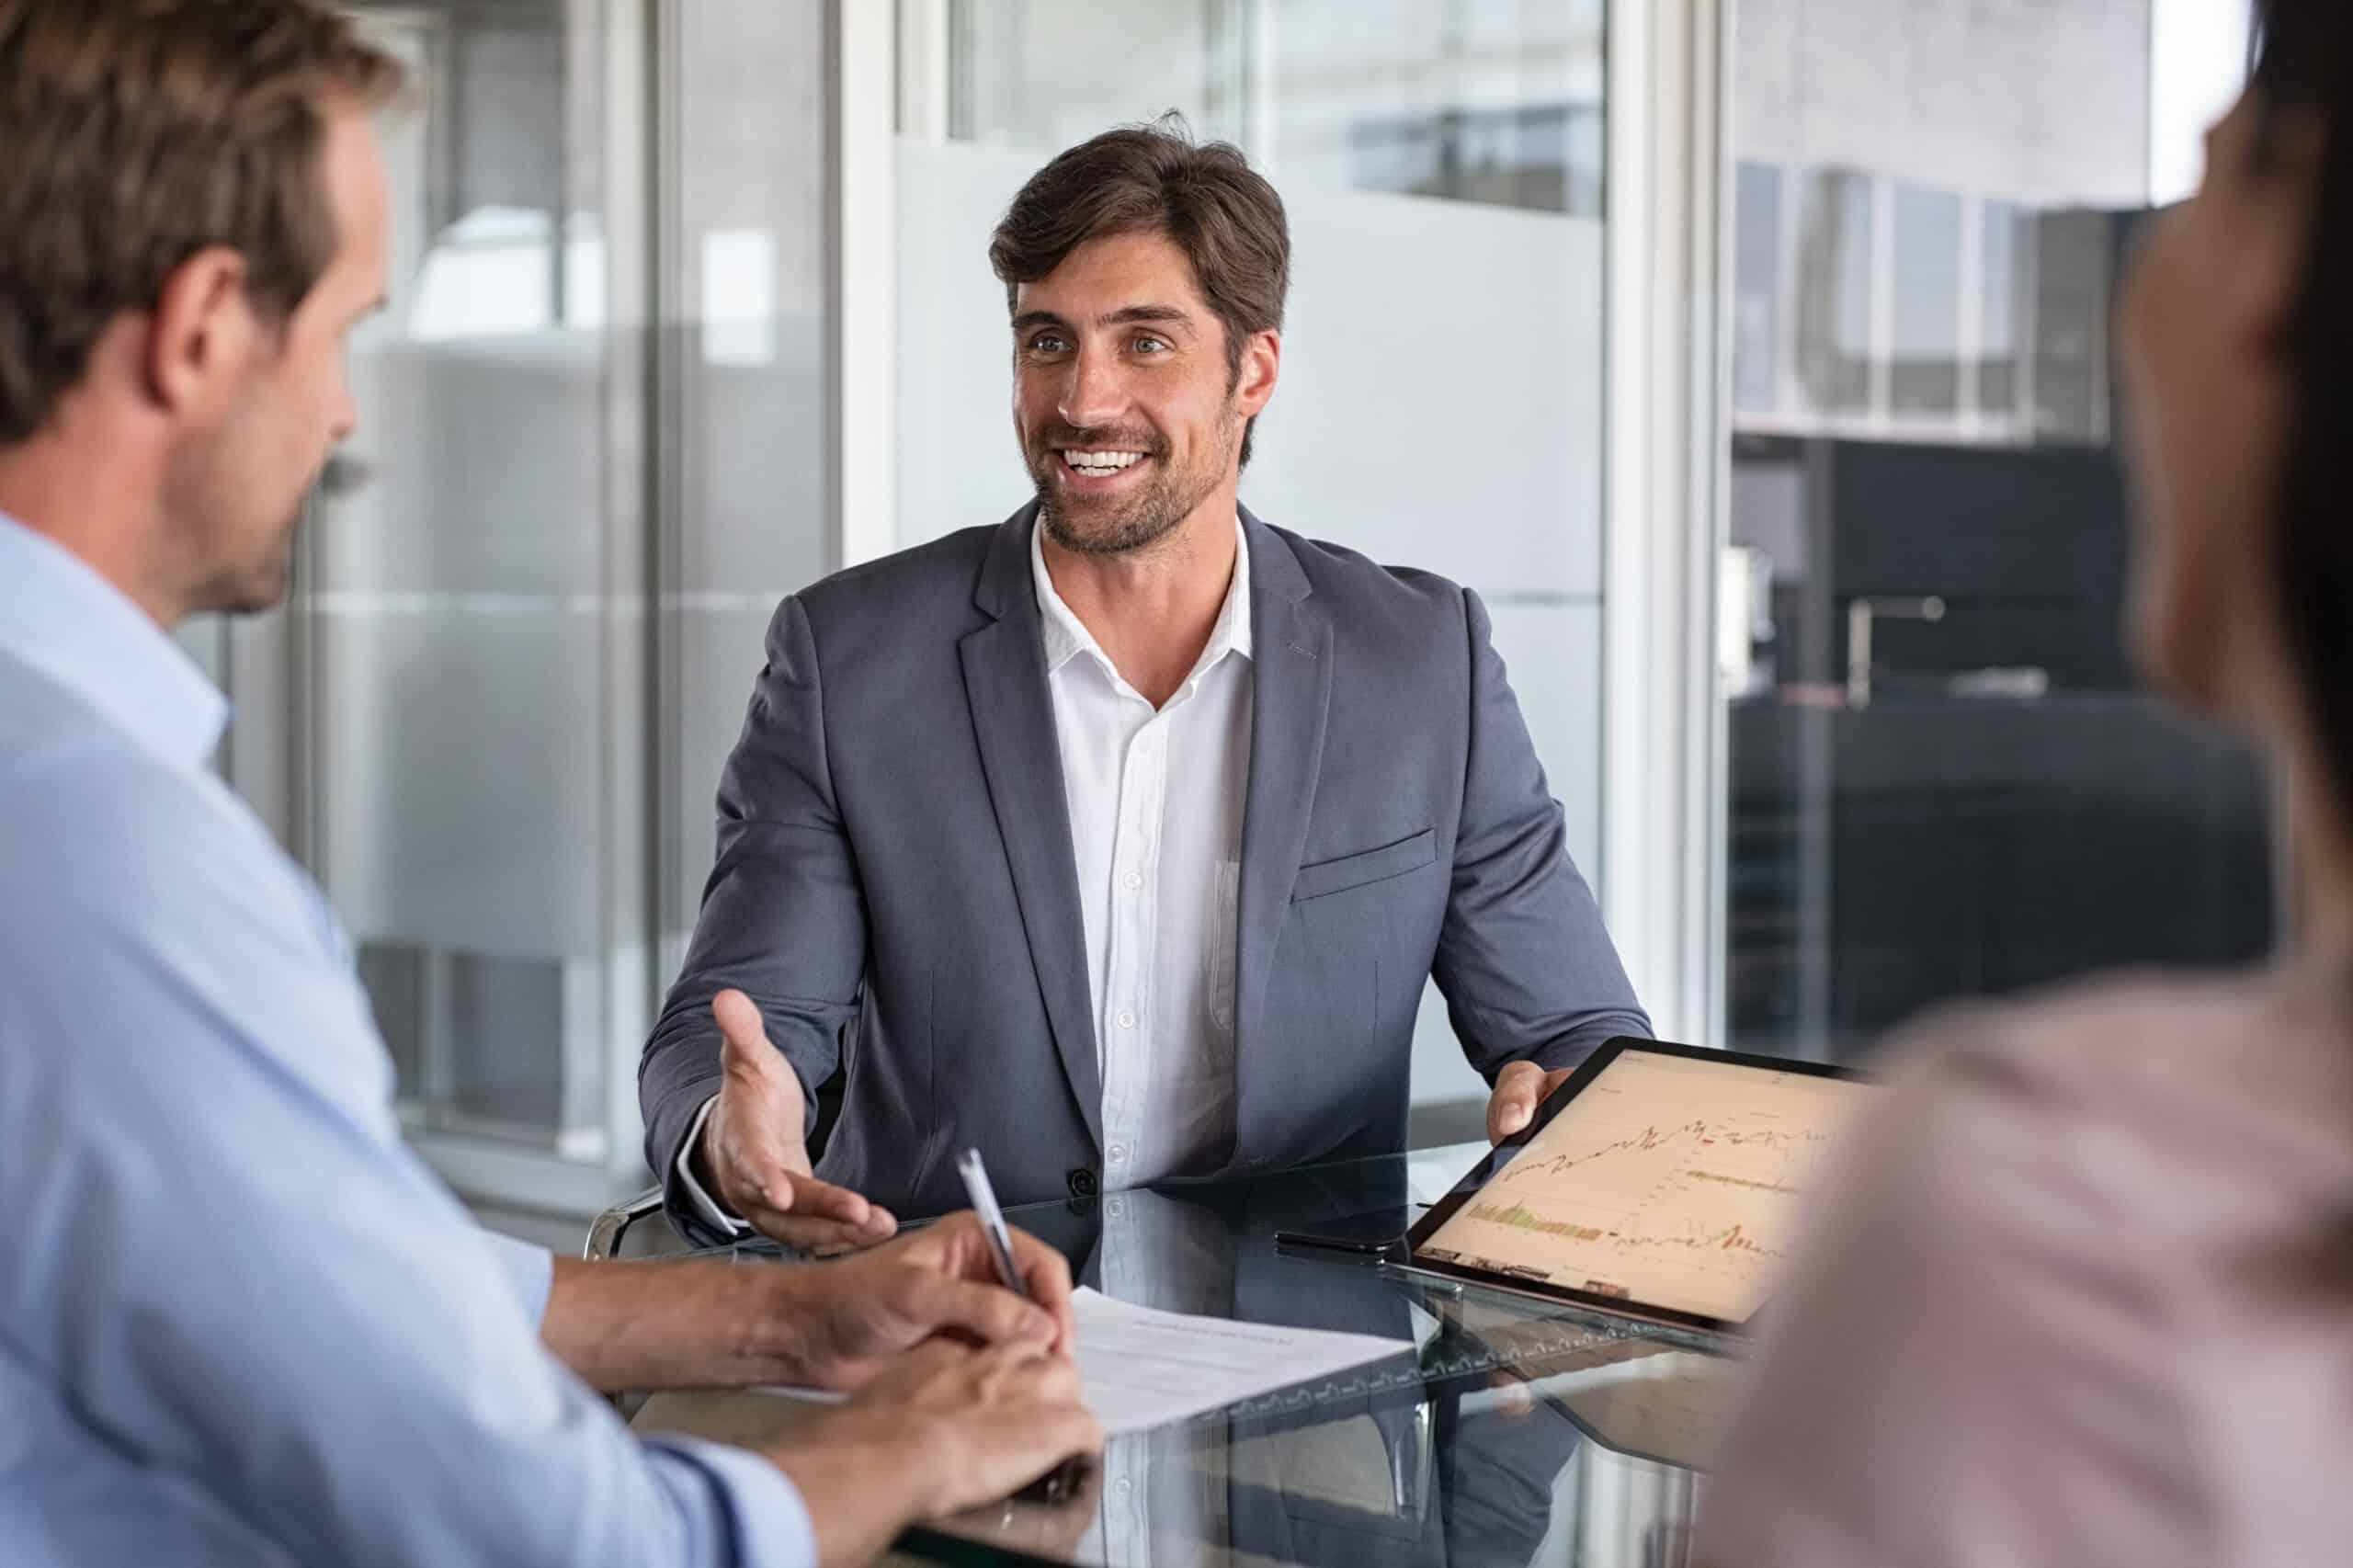 E&O Coverage for financial advisors